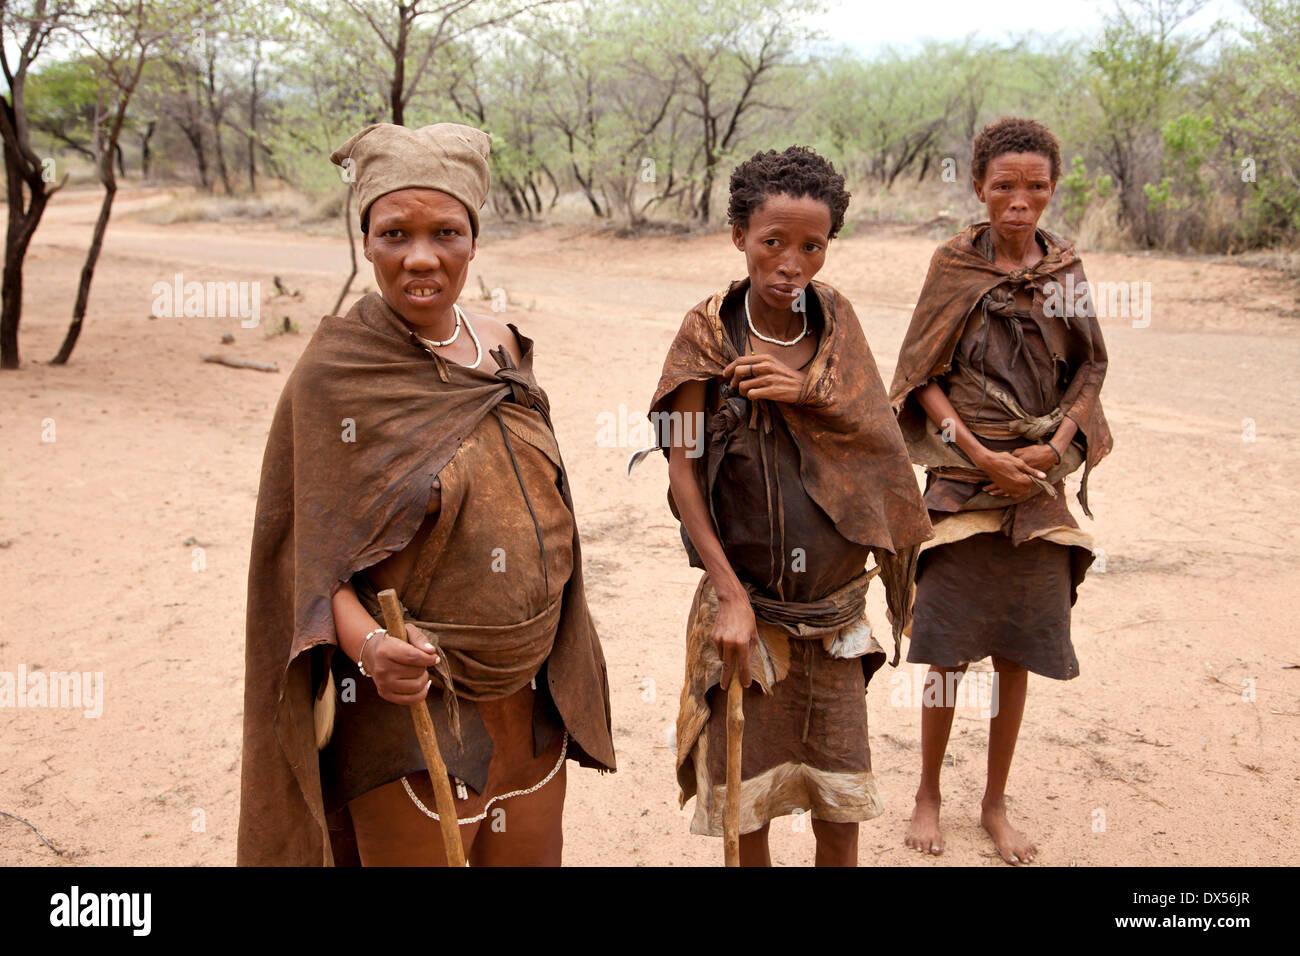 San or Bushmen women in traditional dress, Ghanzi, Botswana - Stock Image